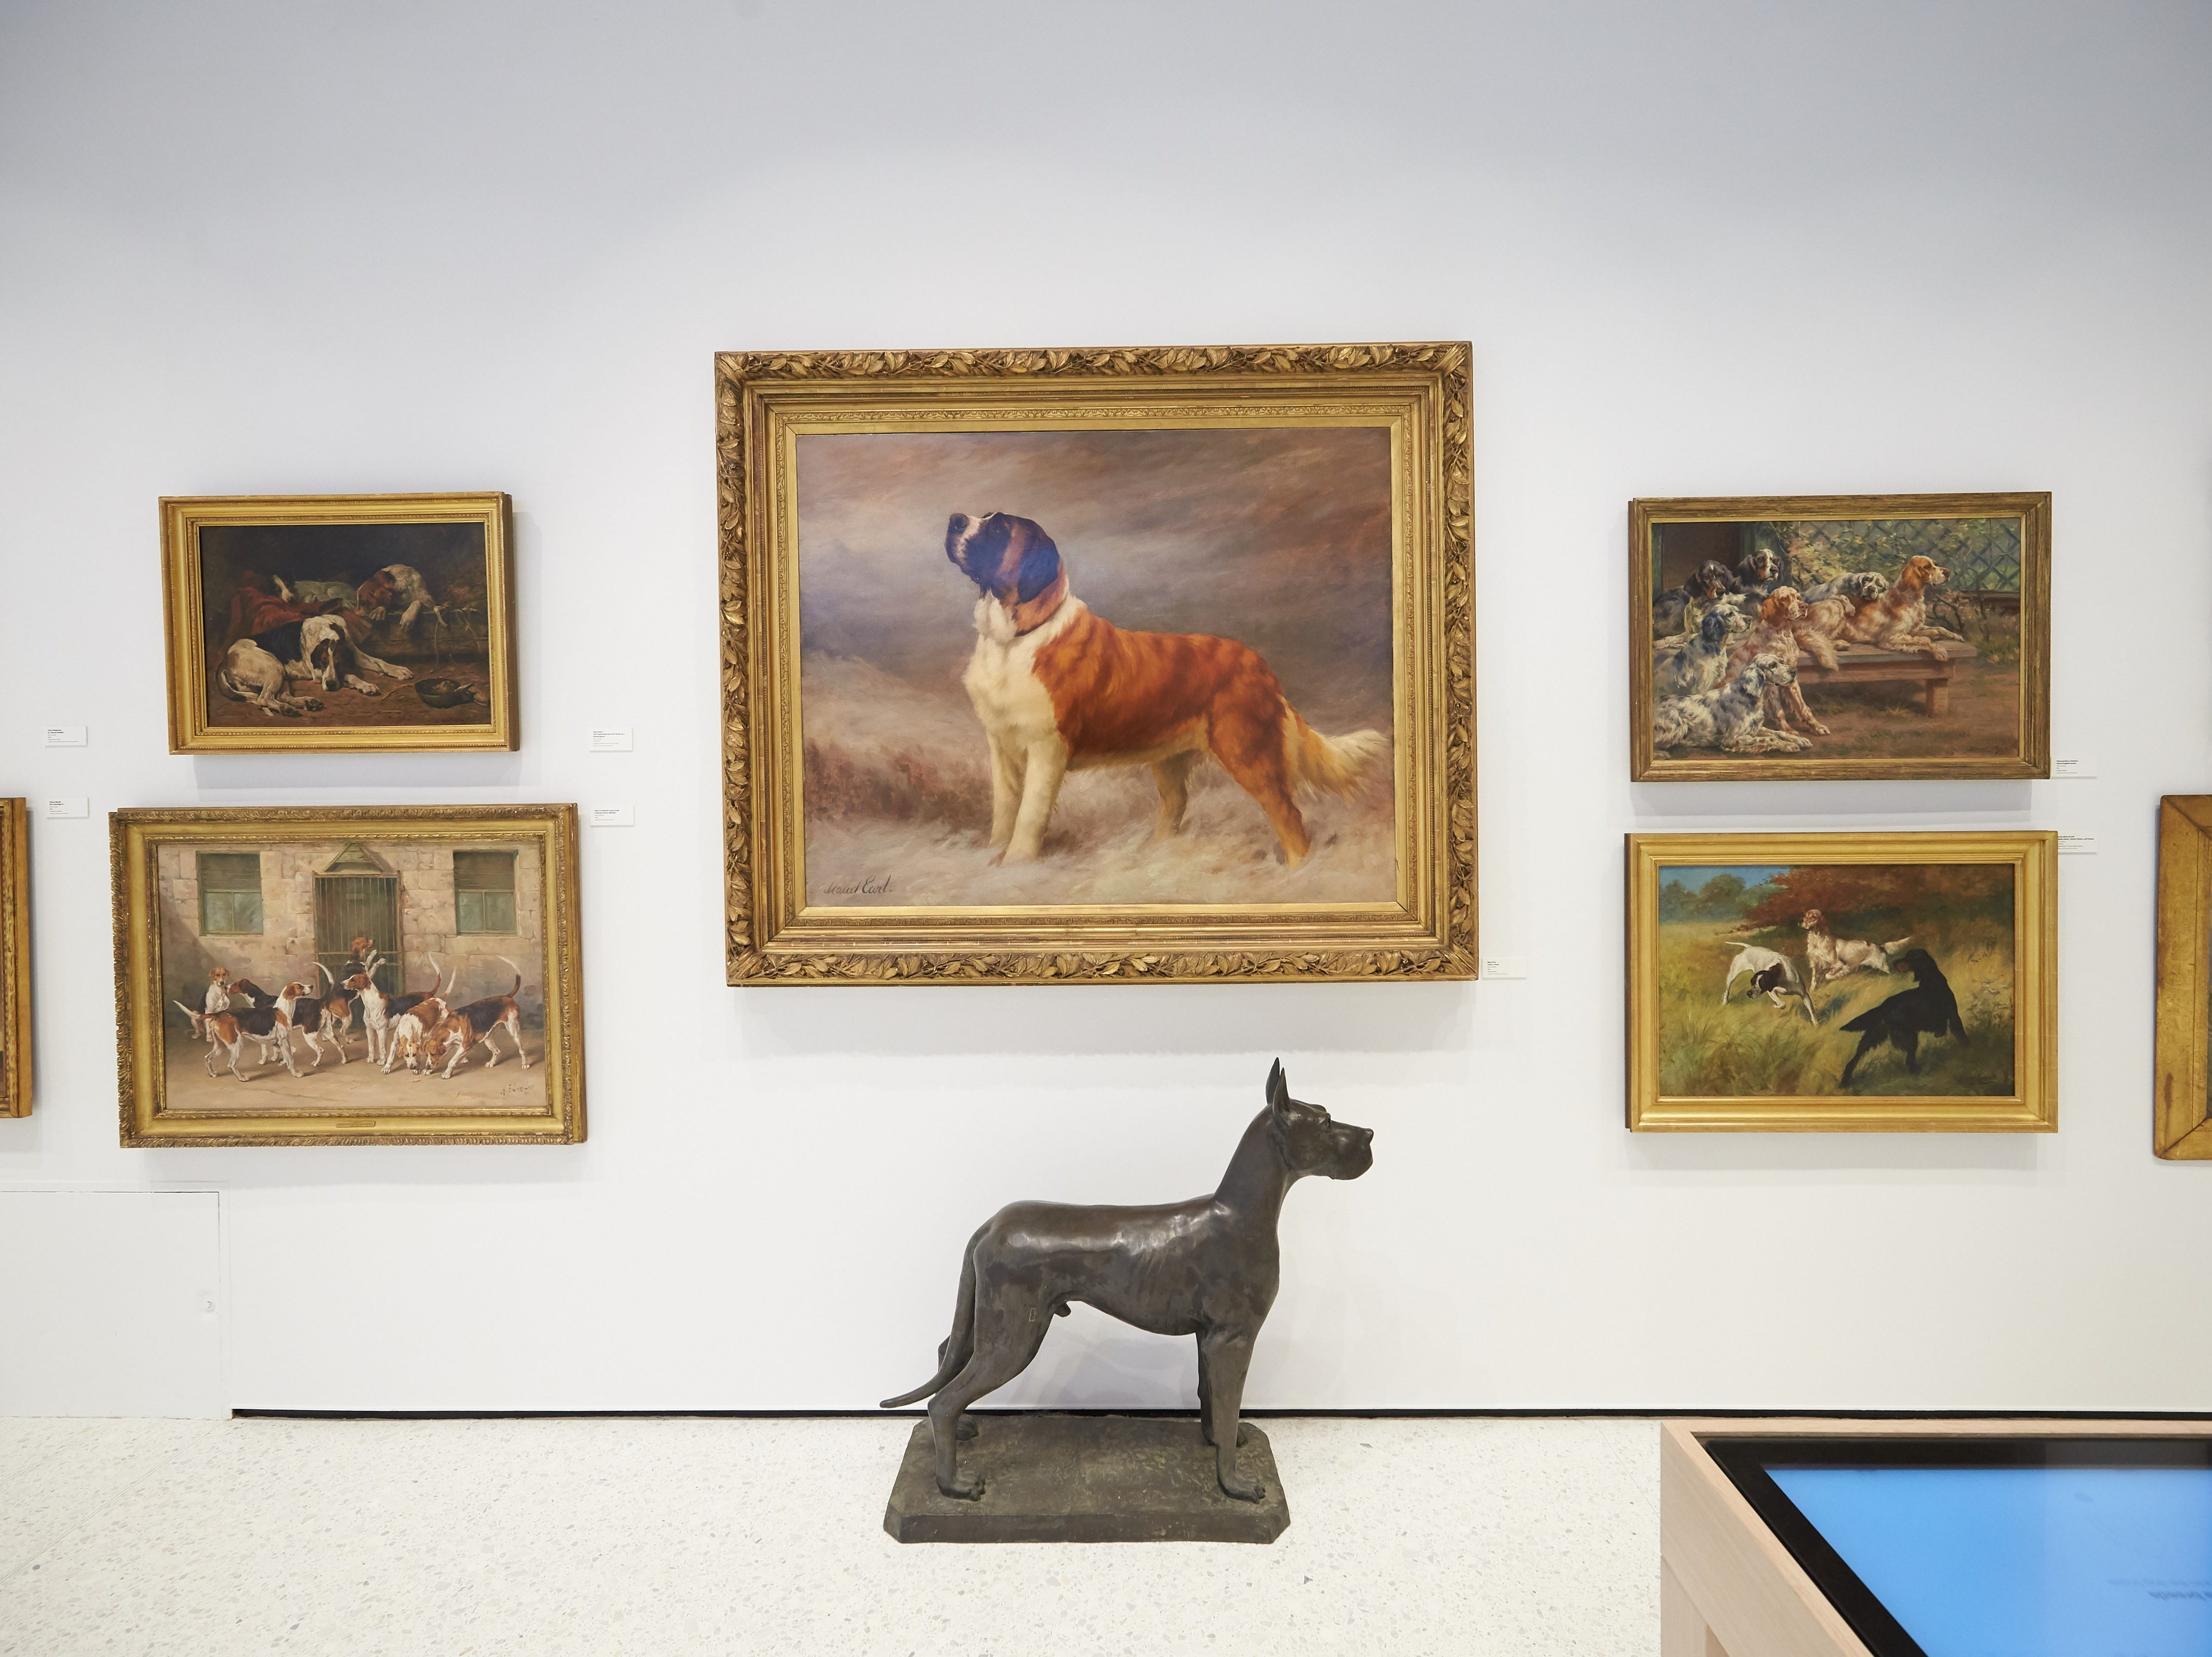 Puppers in fine art.